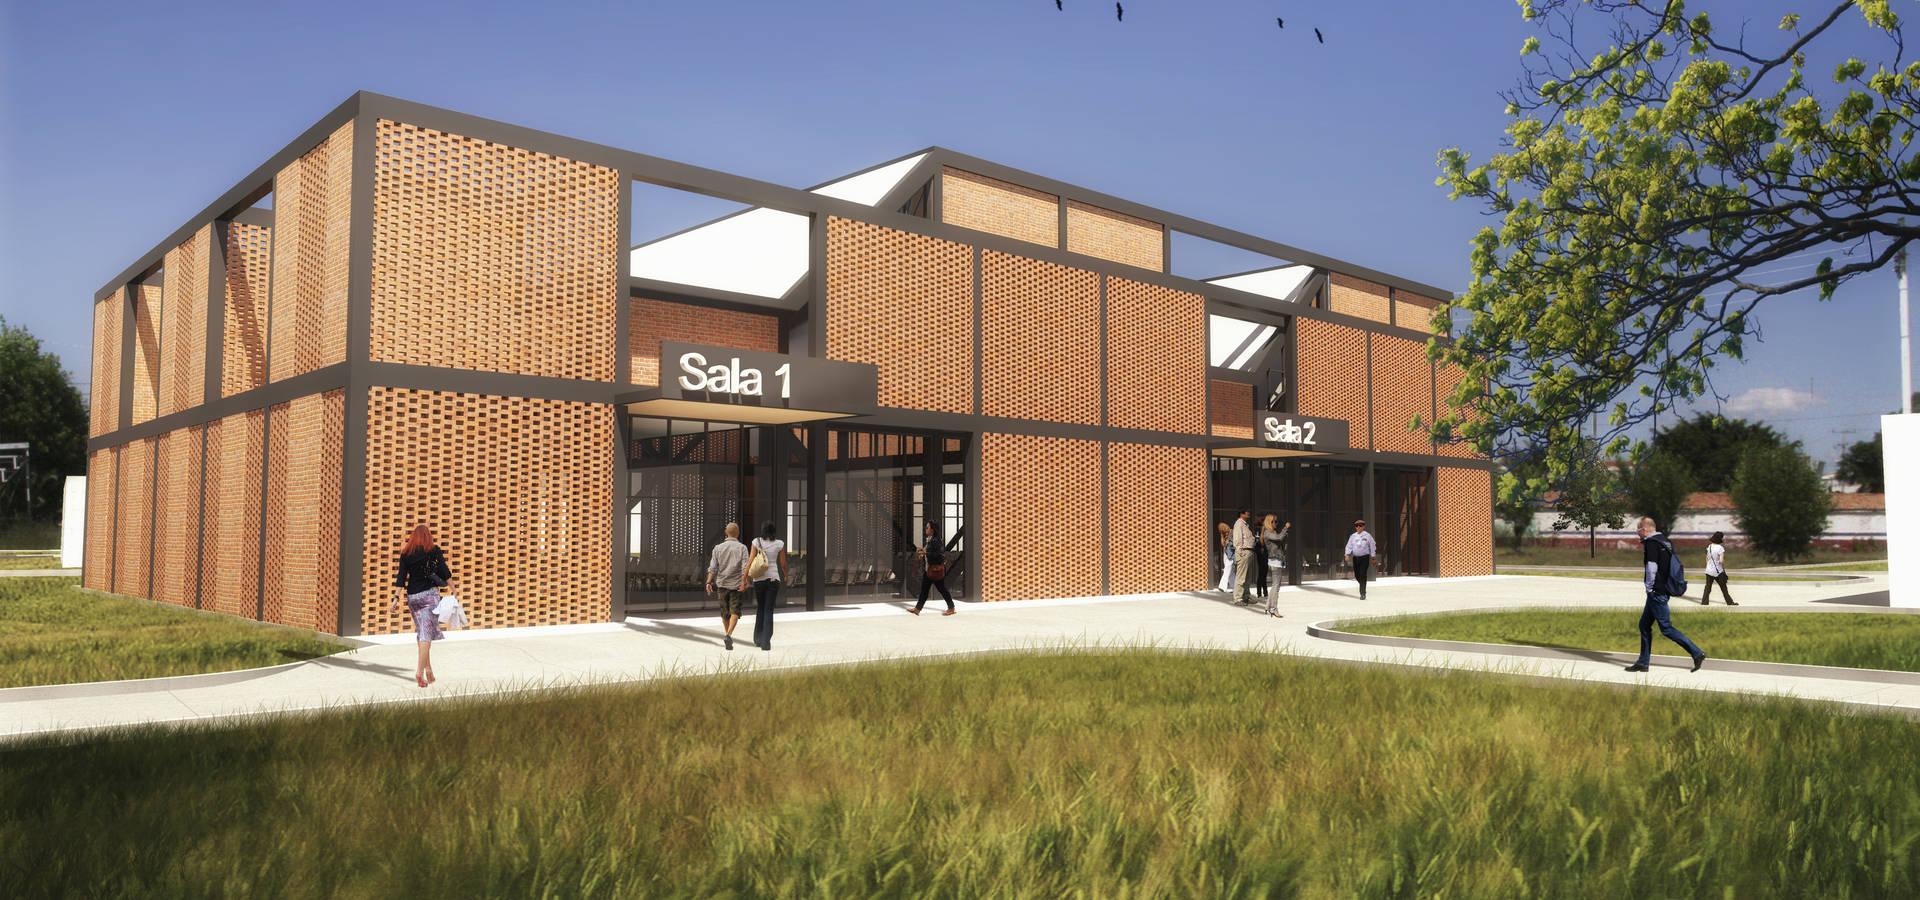 Sal n usos m ltiples ex feria celaya de aura arquitectos for Salon de usos multiples programa arquitectonico